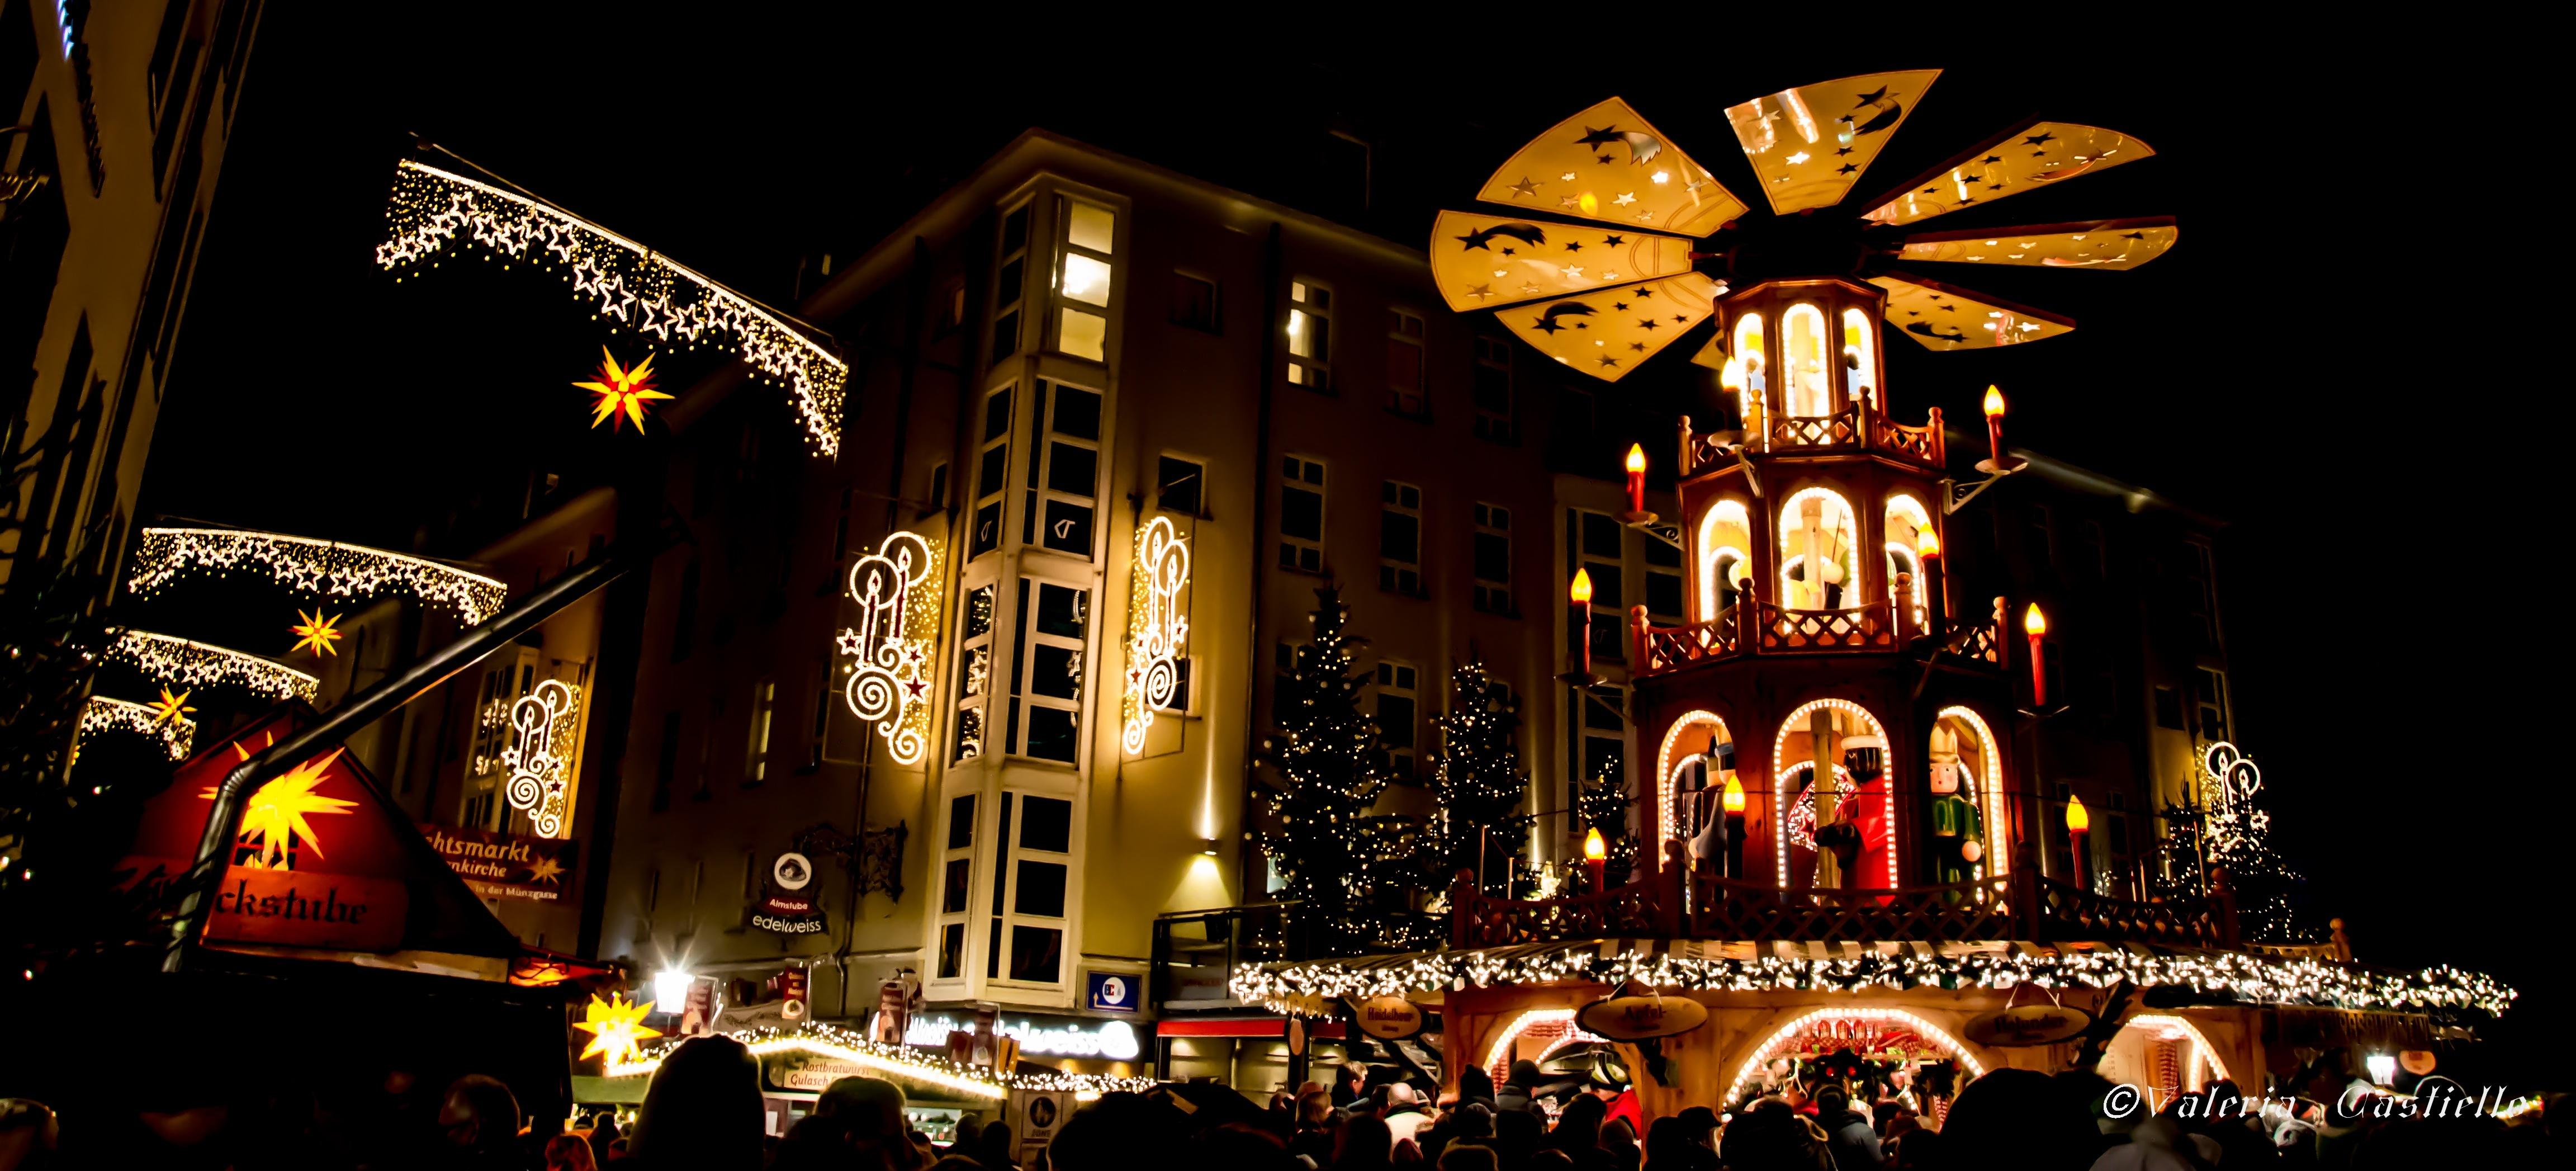 Mercatini di Natale, Germania 2019: guida a prova di Grinch